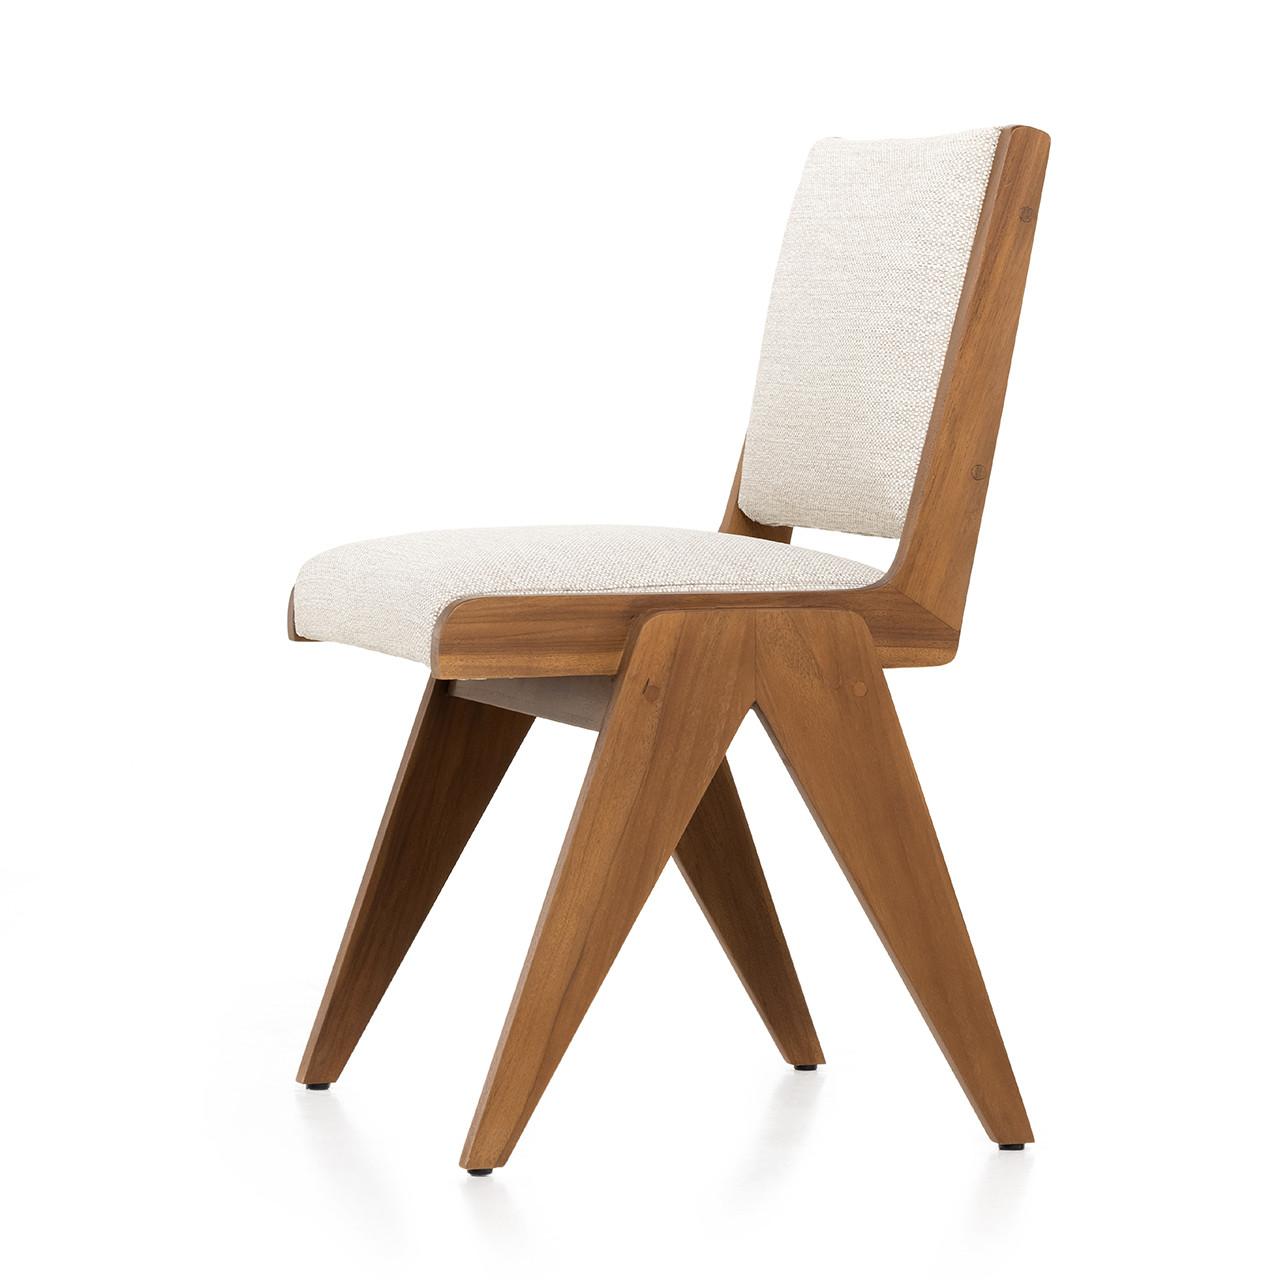 Preston Outdoor Dining Chair - Natural Teak